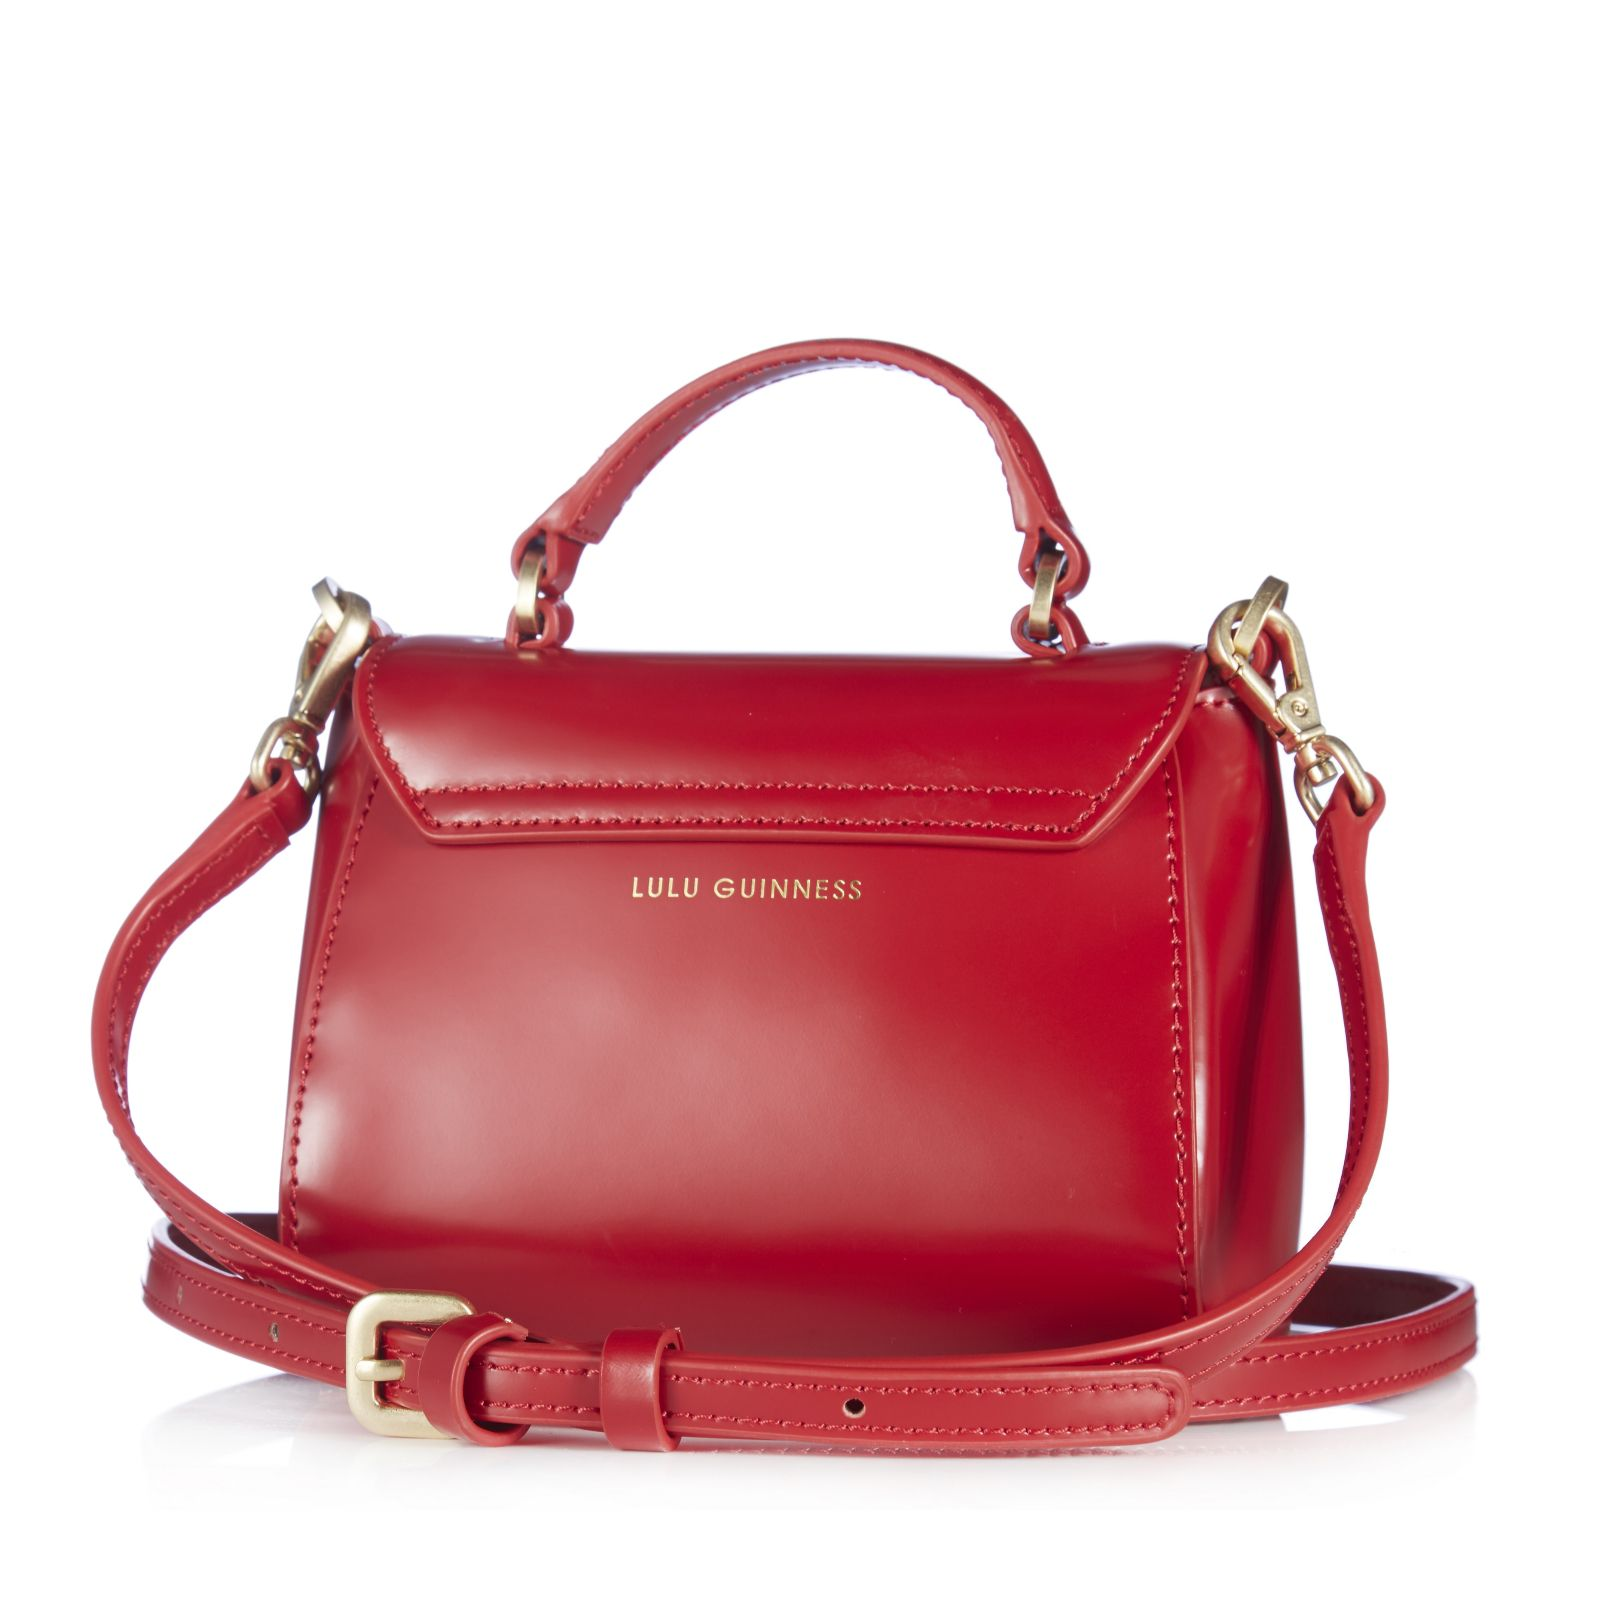 Lulu Guinness Izzy Mini Polished Leather Satchel Handbag Page 1 Qvc Uk